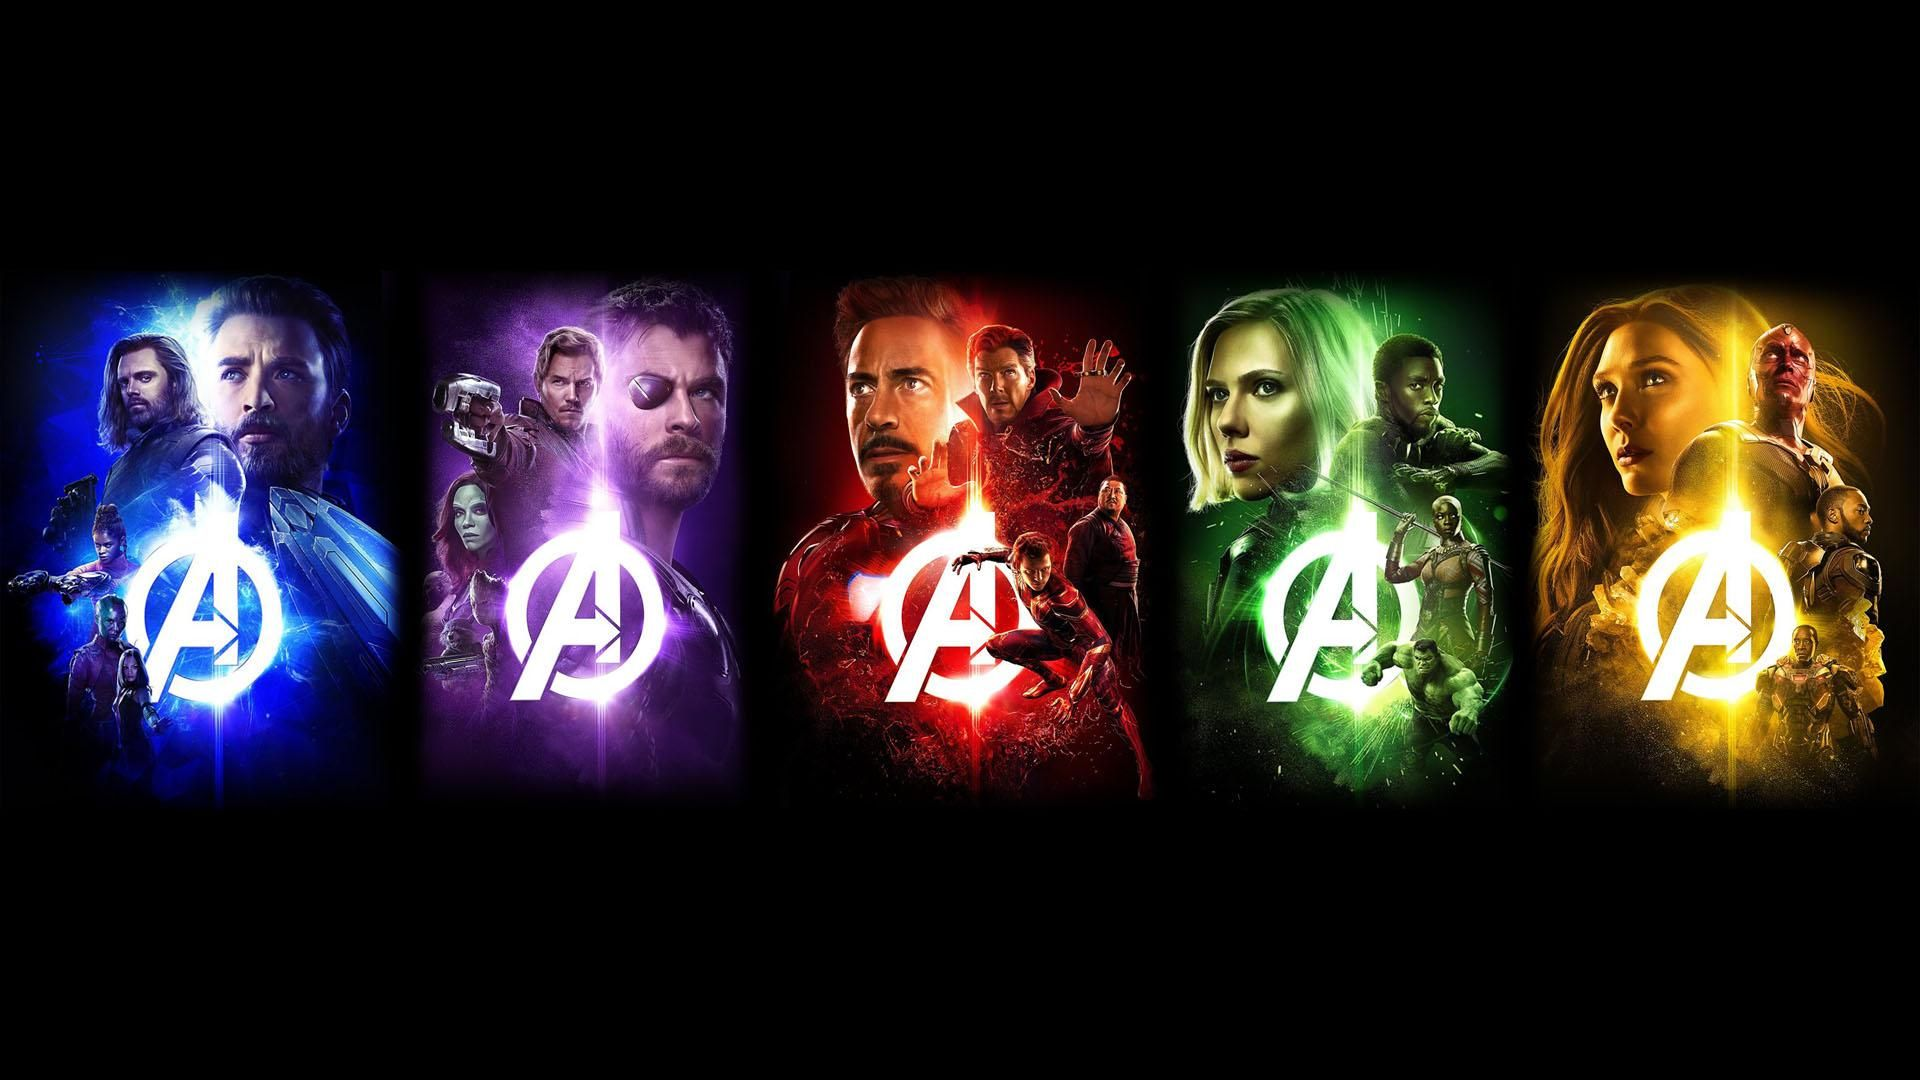 Infinity War Posters Wallpaper Avengers Wallpaper Avengers Infinity War Avengers